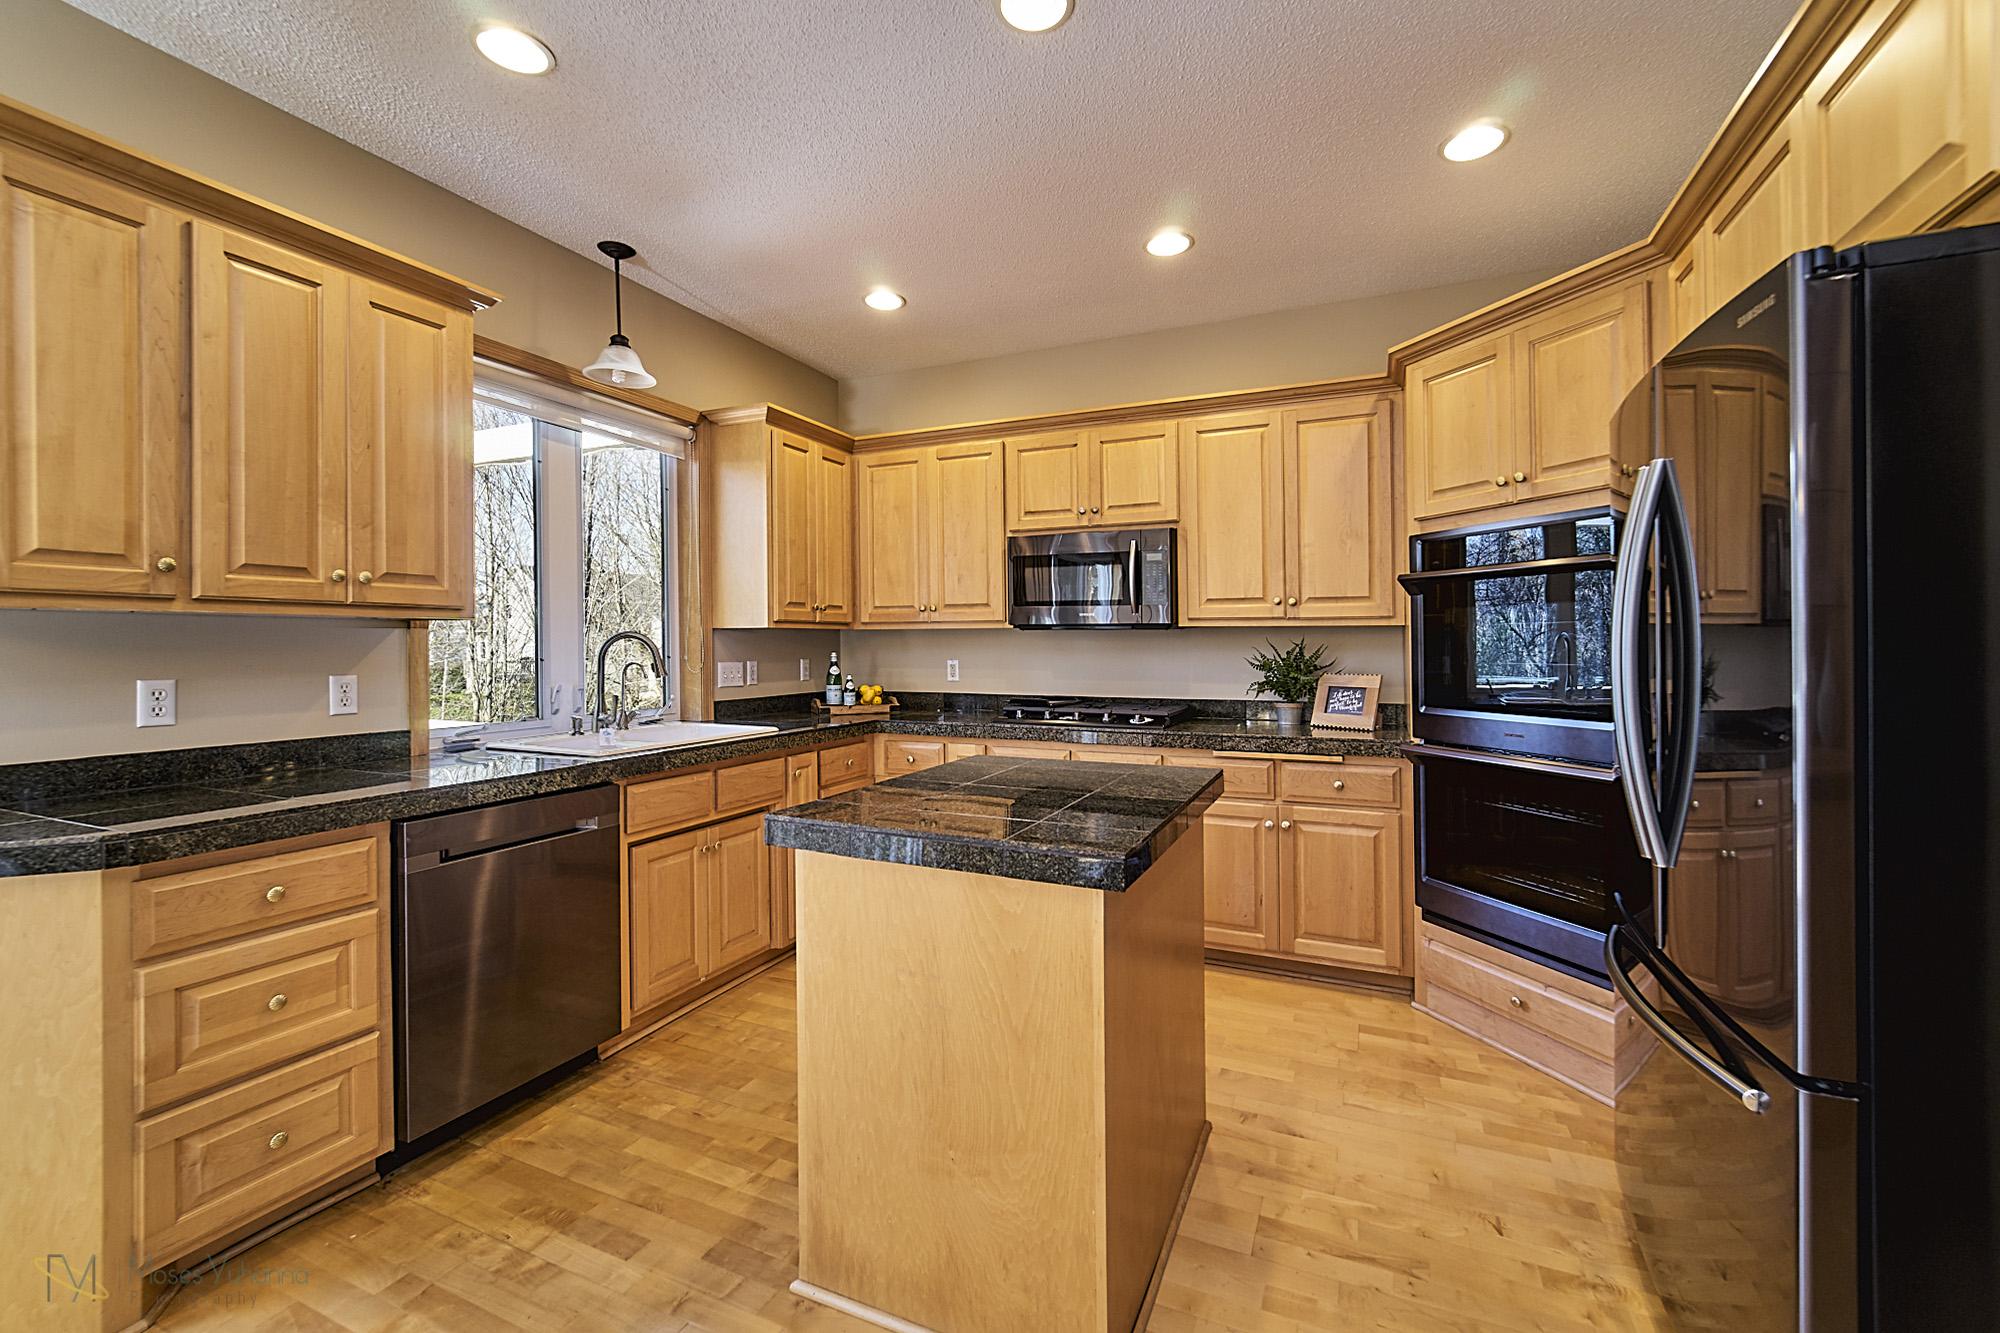 13770-Cottonwood-St-NW-Andover 9 kitchen.jpg